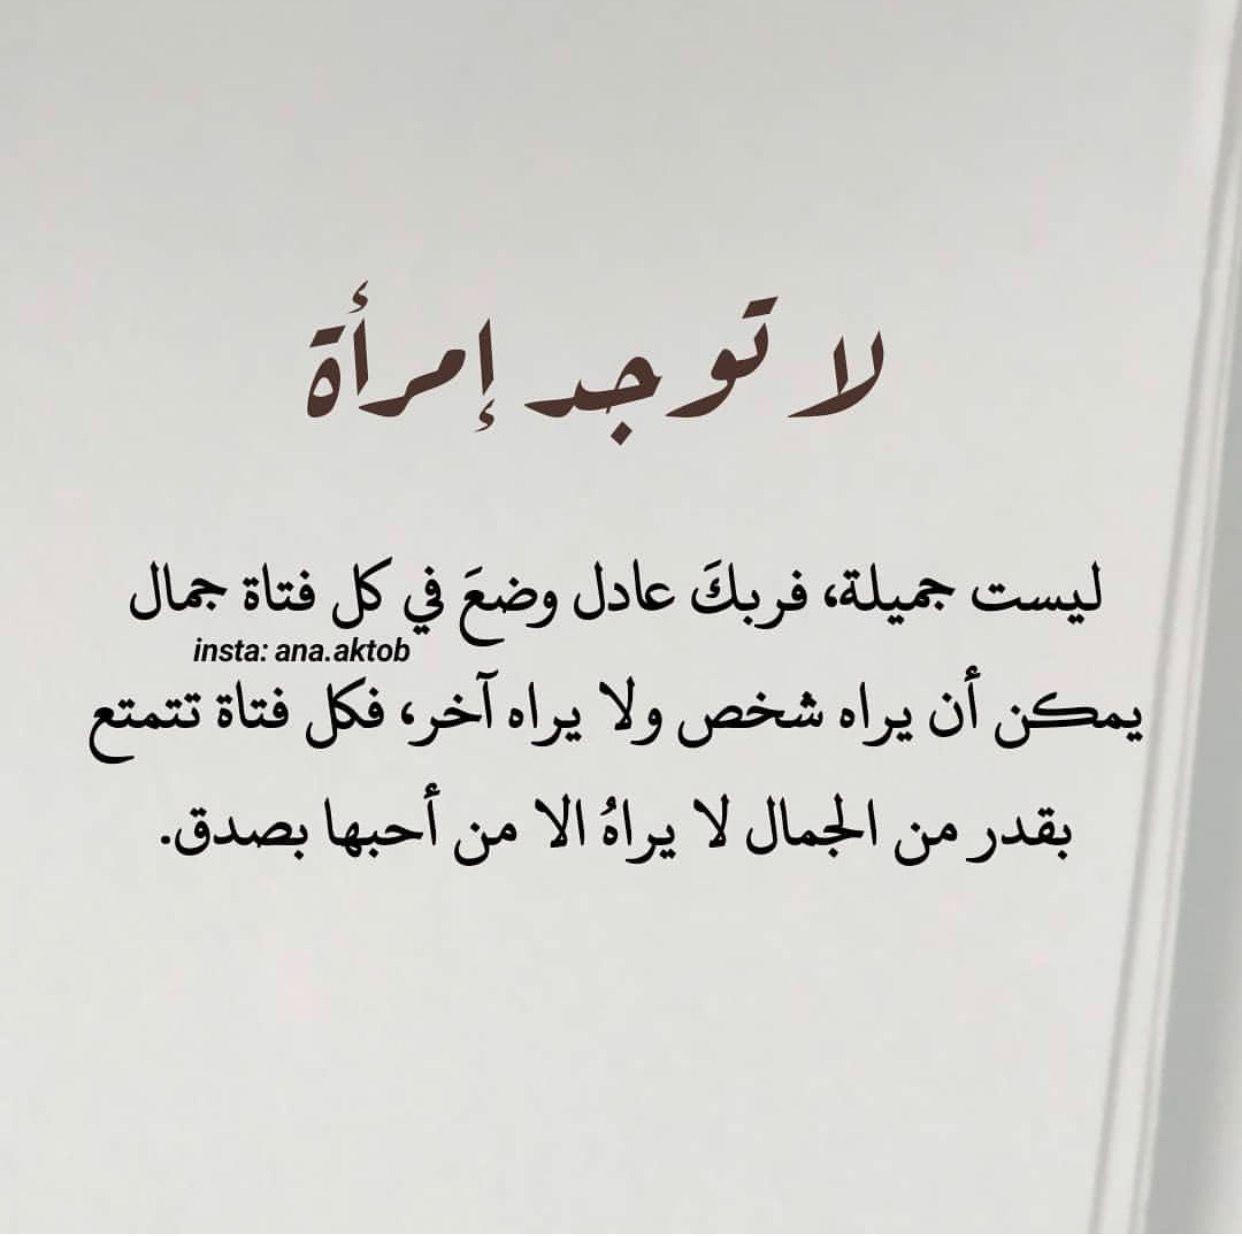 ثم إن الله جميل وكل ما يأتي من الجميل جميل Life Quotes Arabic Quotes With Translation Love Words